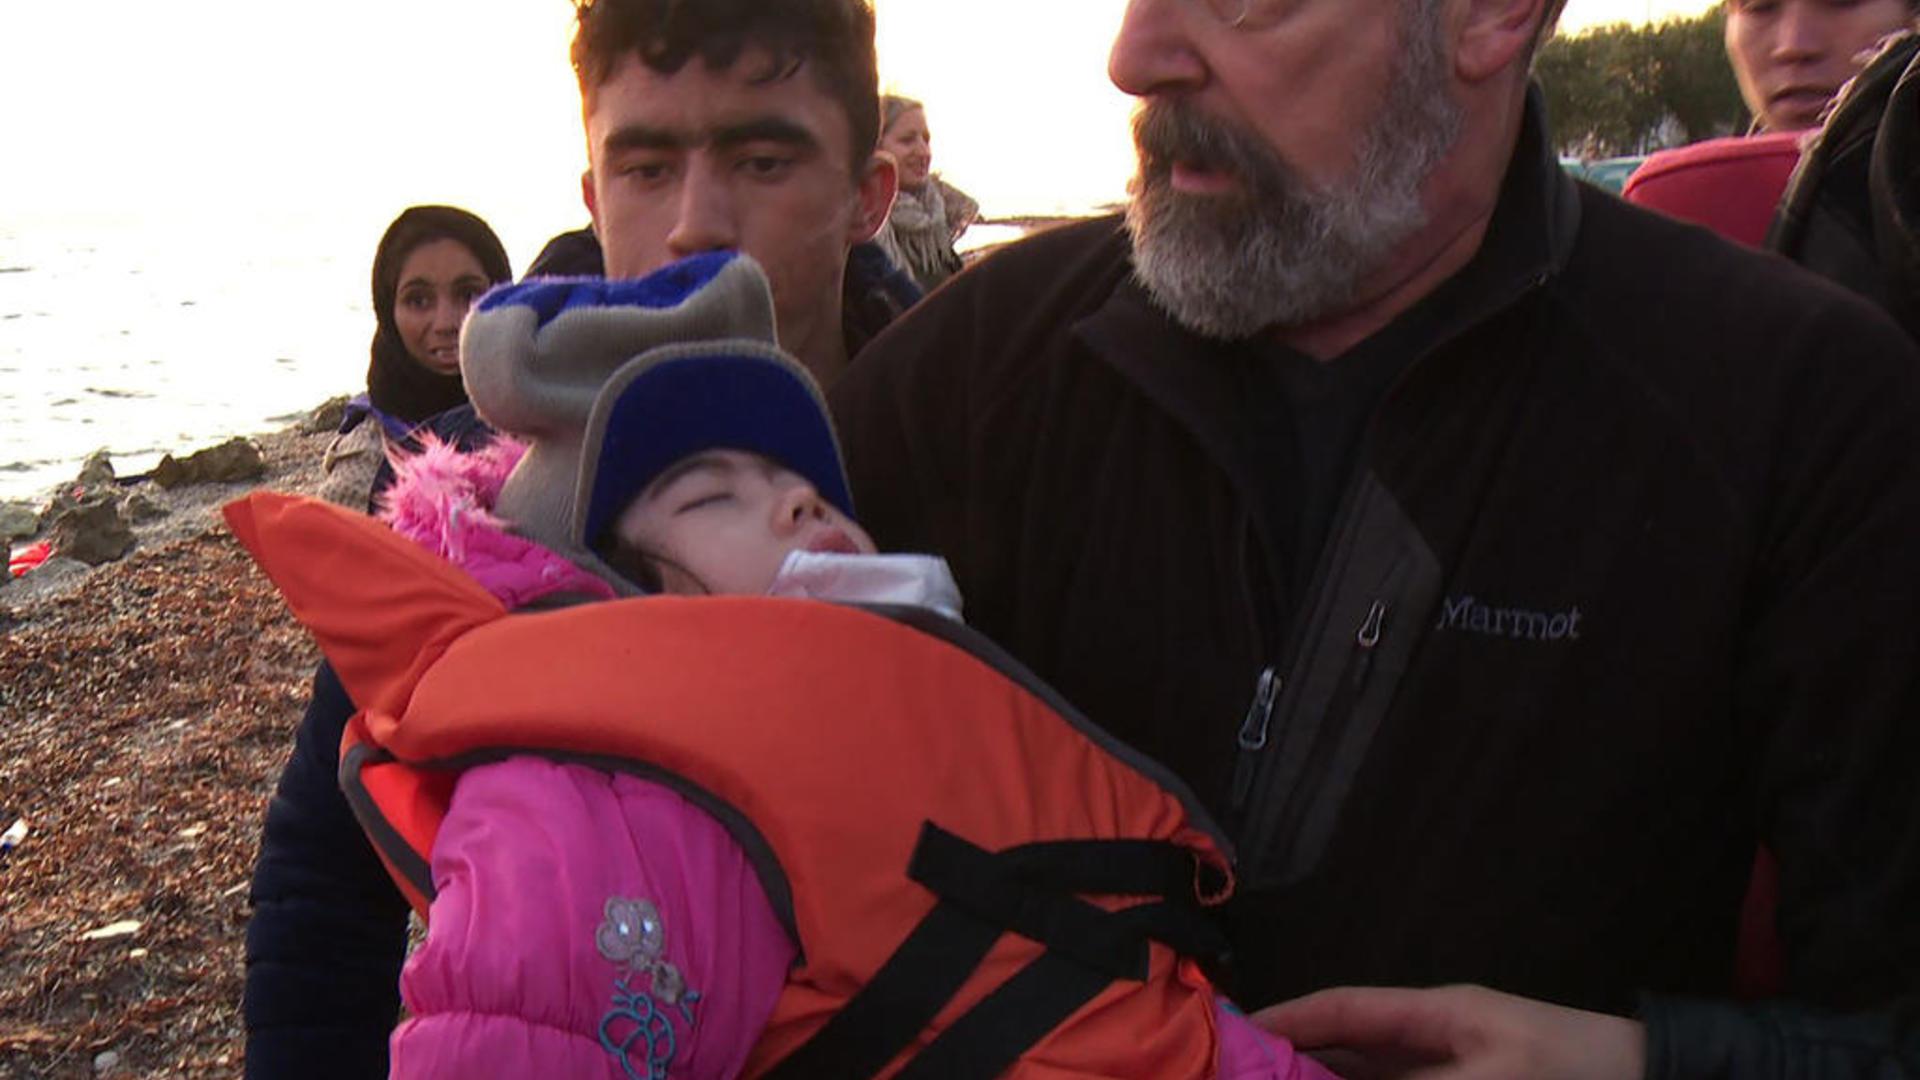 Mandy Patinkin carries Masuma, a young Afghan refugee onto a Greek beach